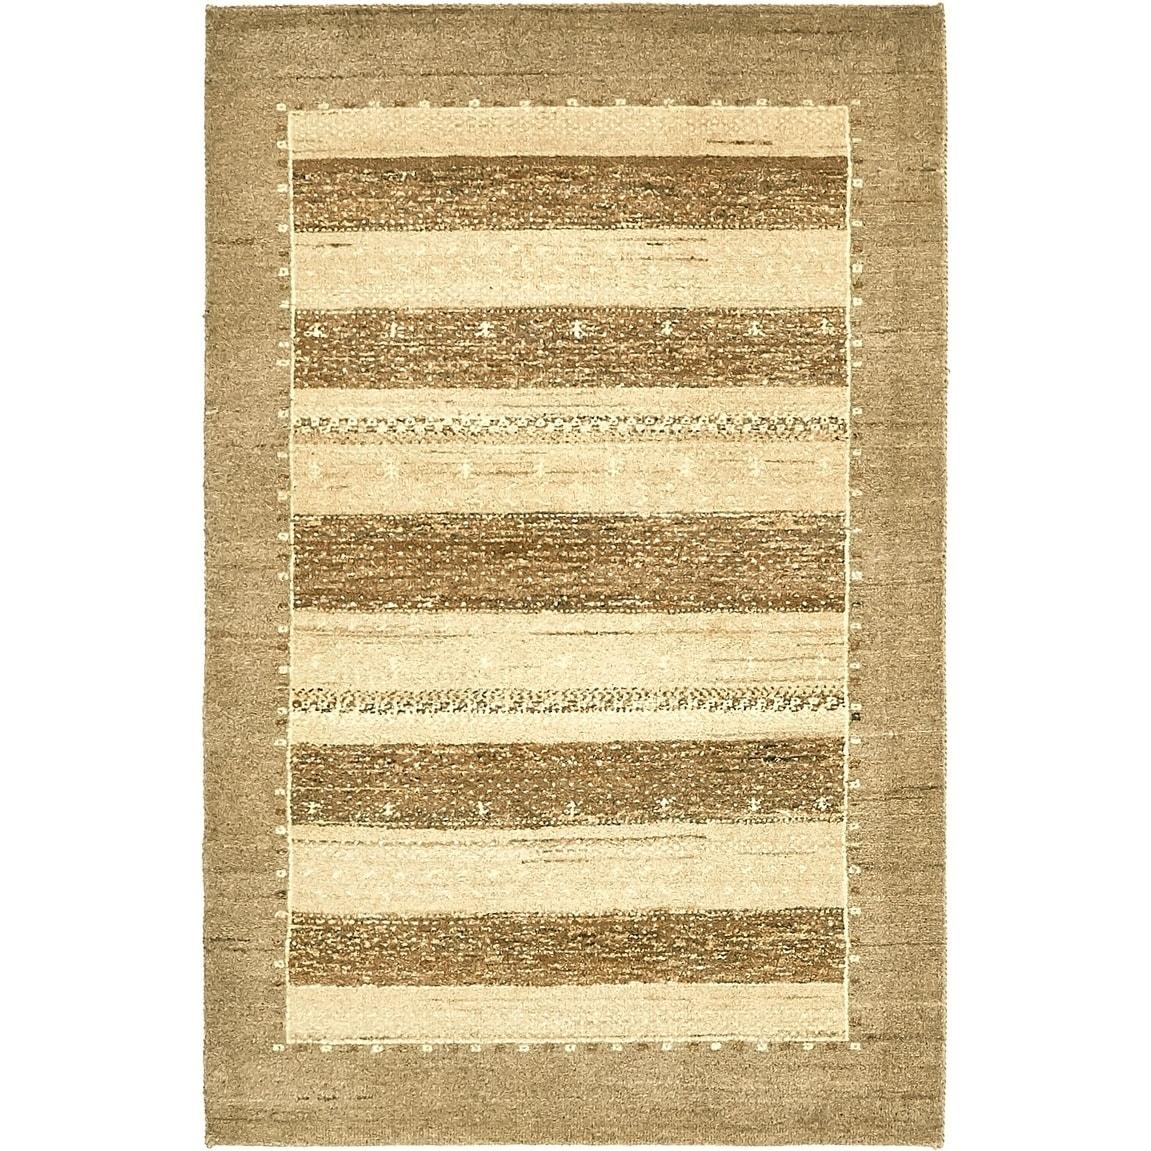 Hand Knotted Kashkuli Gabbeh Wool Area Rug - 3 2 x 4 10 (gray - 3 2 x 4 10)